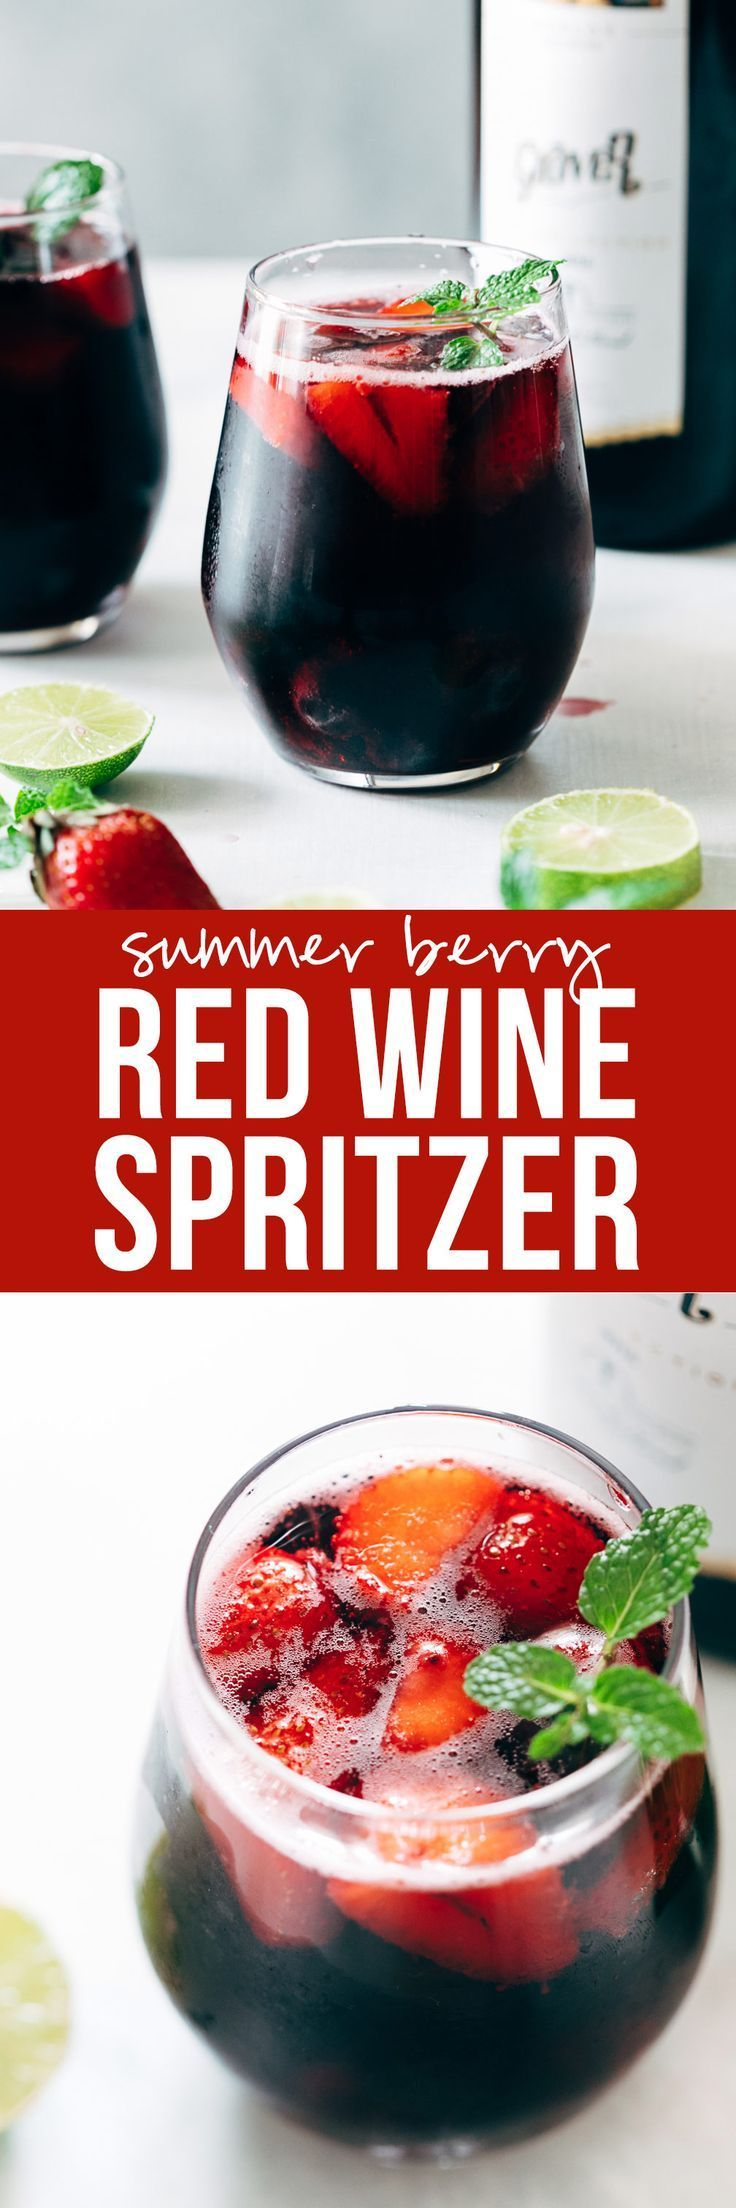 Summer Berry Red Wine Spritzer Wine Cocktail Recipe Strawberry Blackberry Blueberries Low Calorie Wine Cocktail Recipes Wine Spritzer Red Wine Spritzer